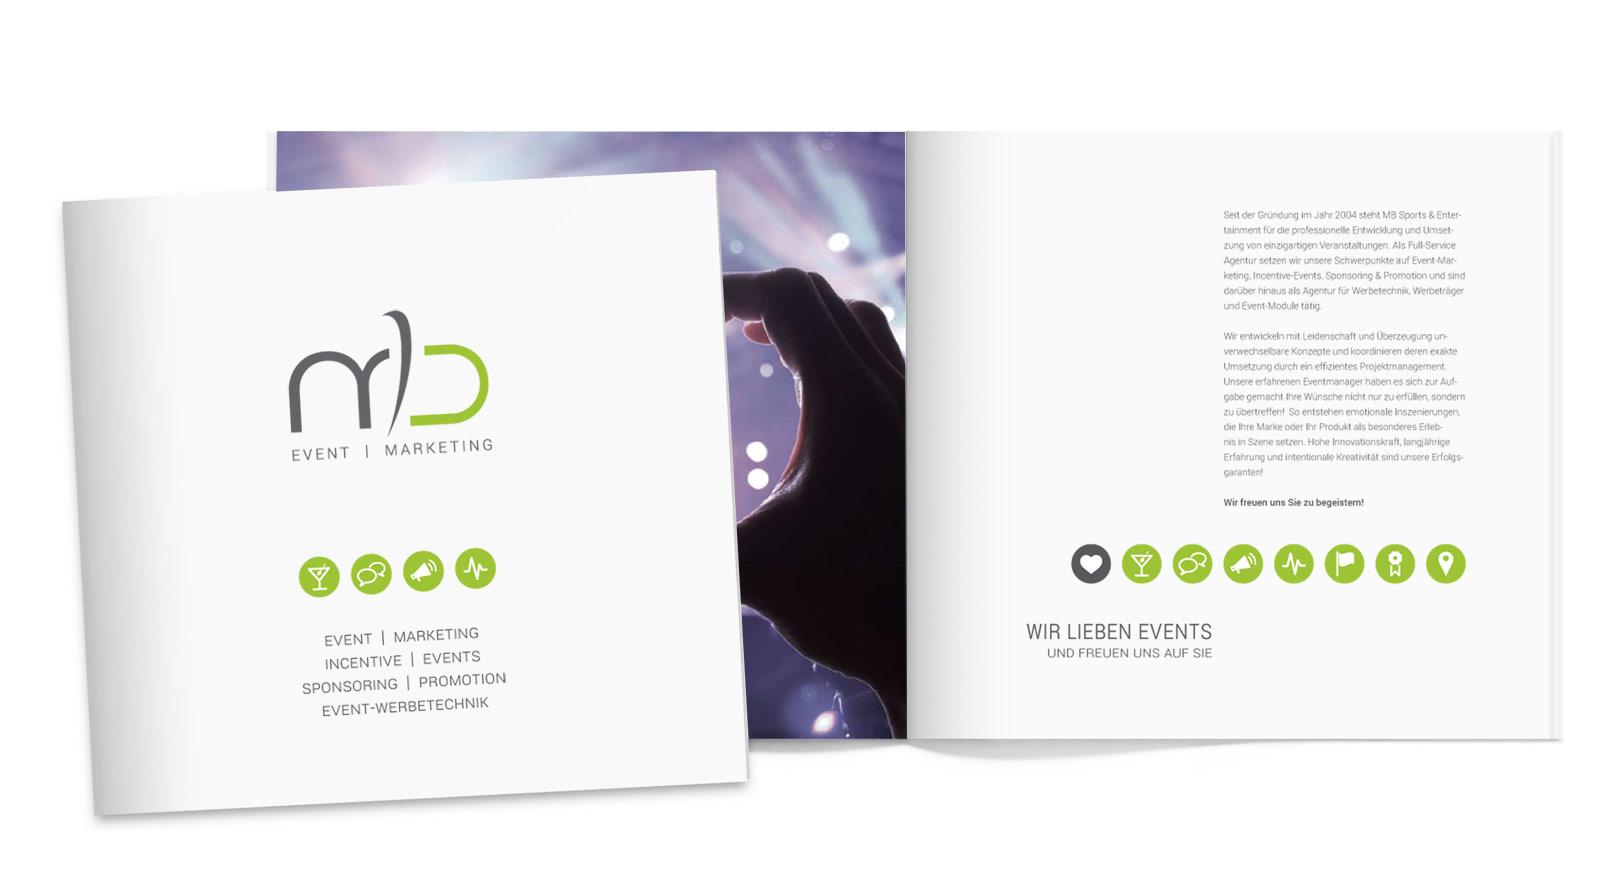 Image Broschüre | MB Sports & Entertainment GmbH & Co. KG